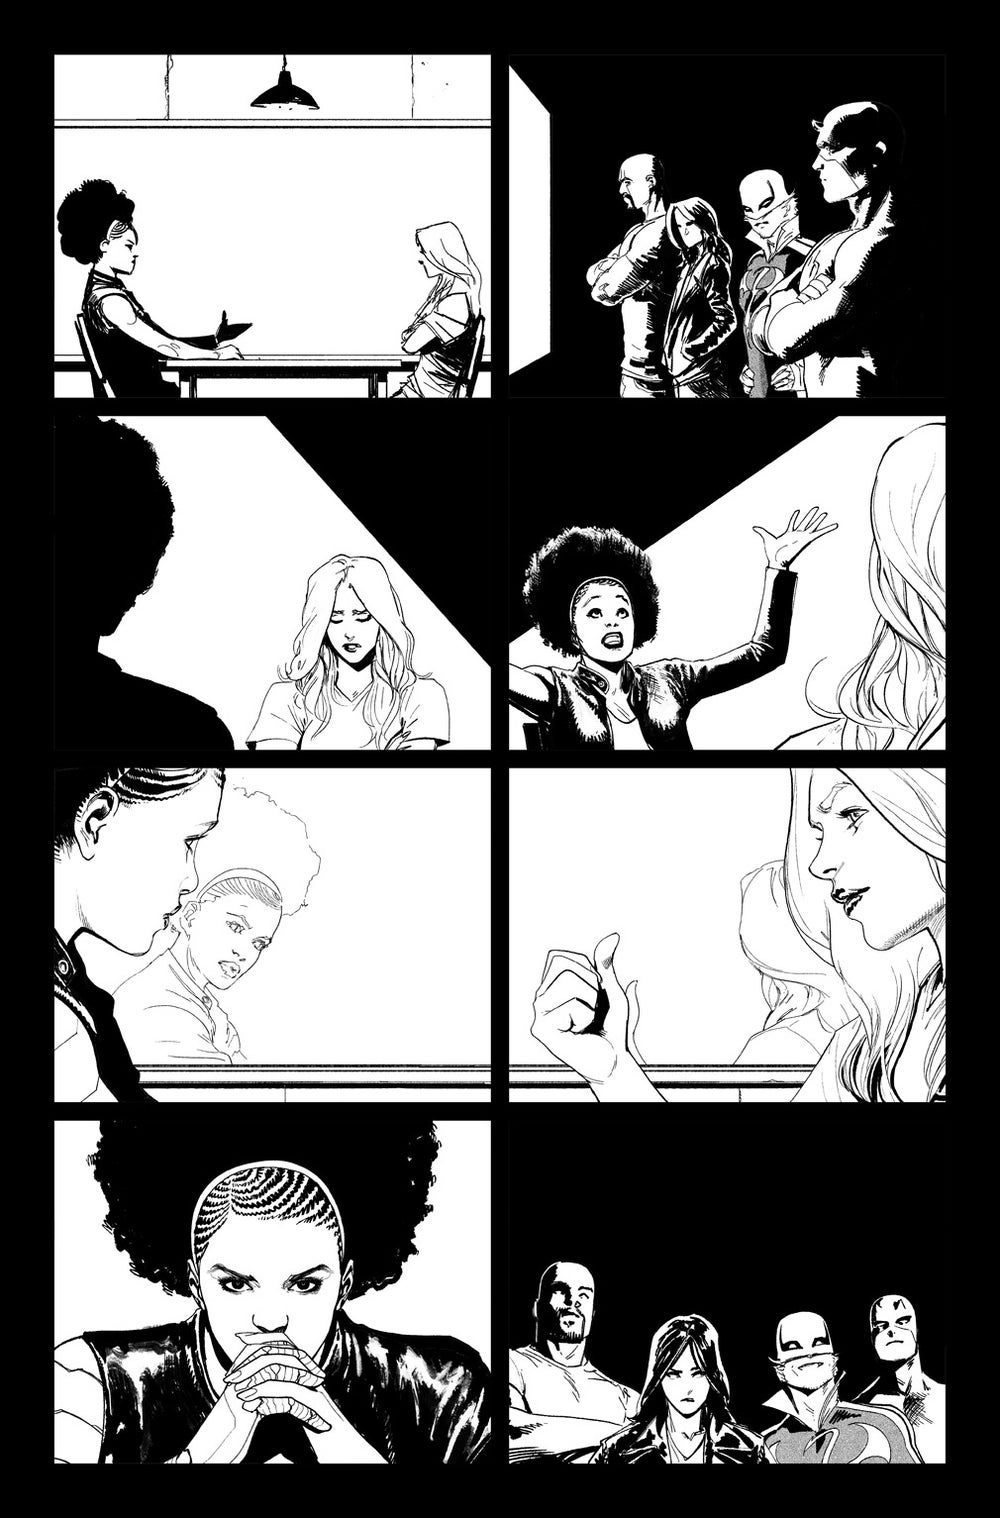 Image of DEFENDERS #10, p.12 ARTIST'S PROOF